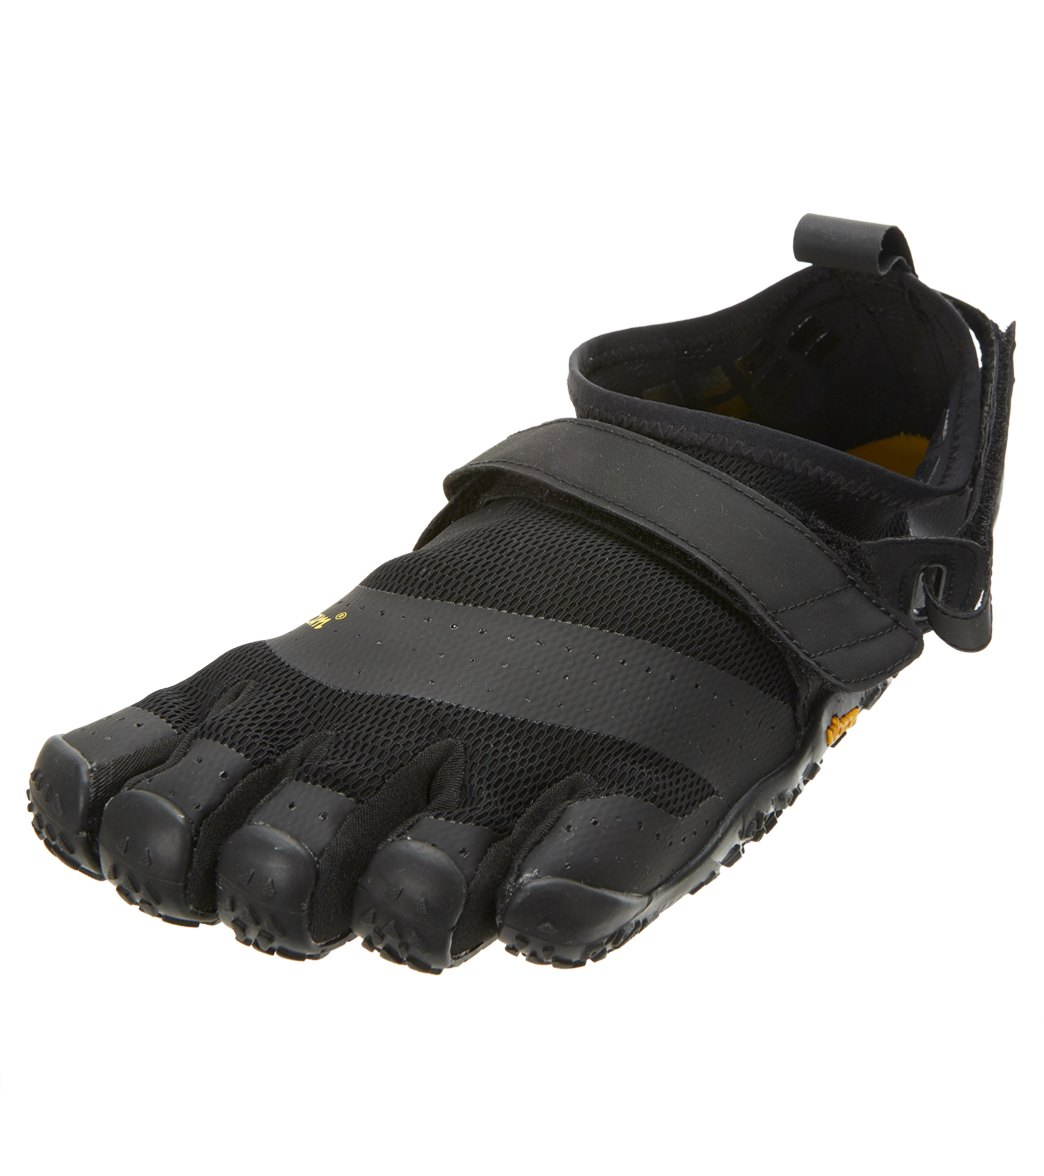 new style 7cda1 5df63 Vibram Fivefingers Men s V-Aqua Water Shoe at SwimOutlet.com - Free Shipping